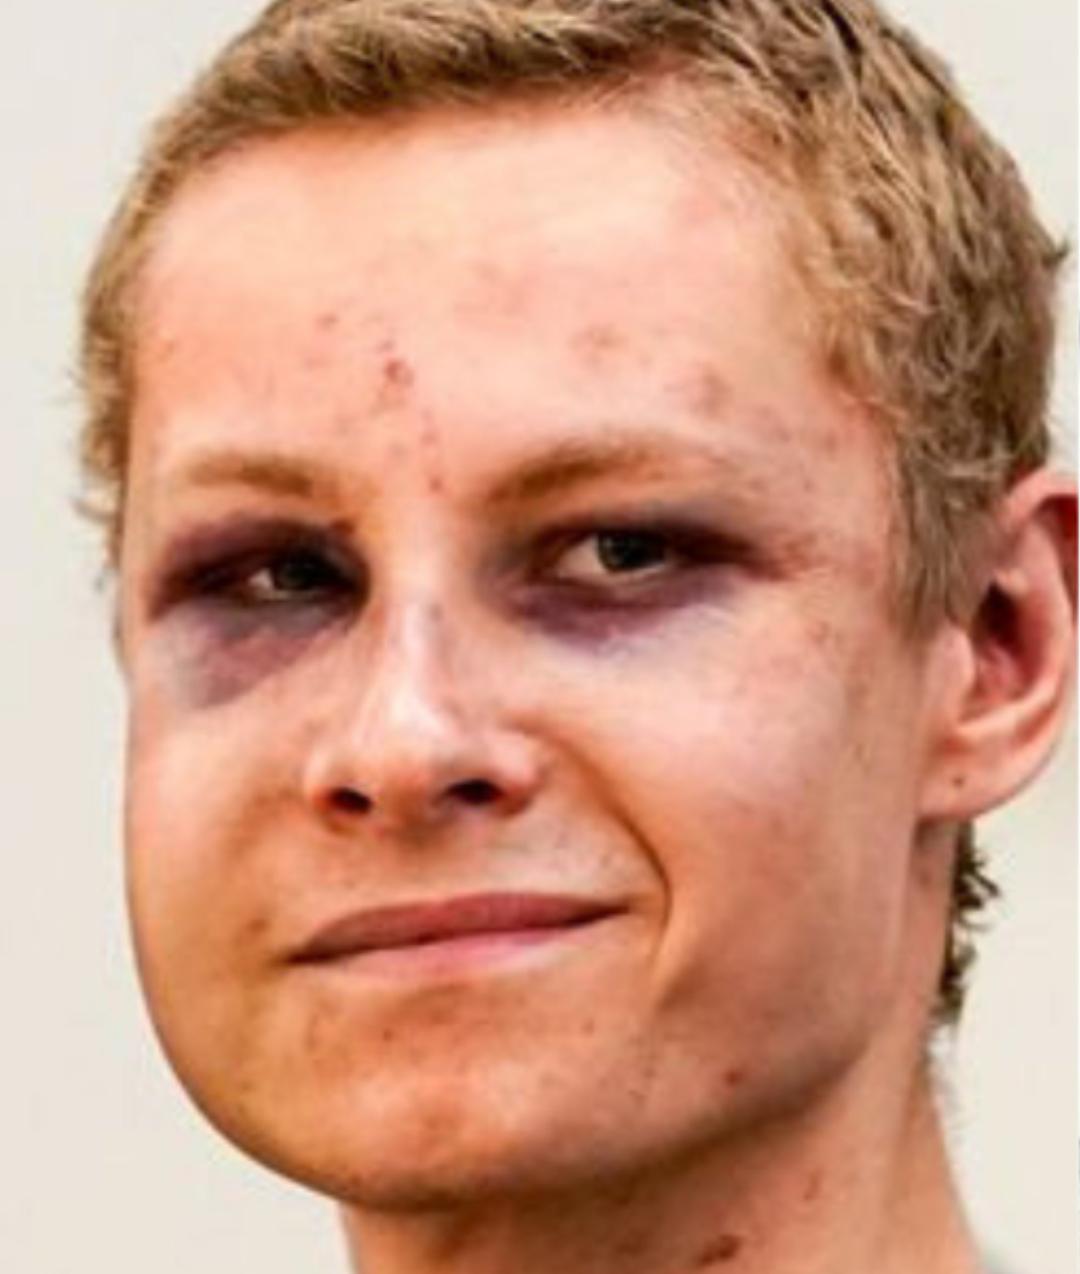 Philip Manshaus of Norway